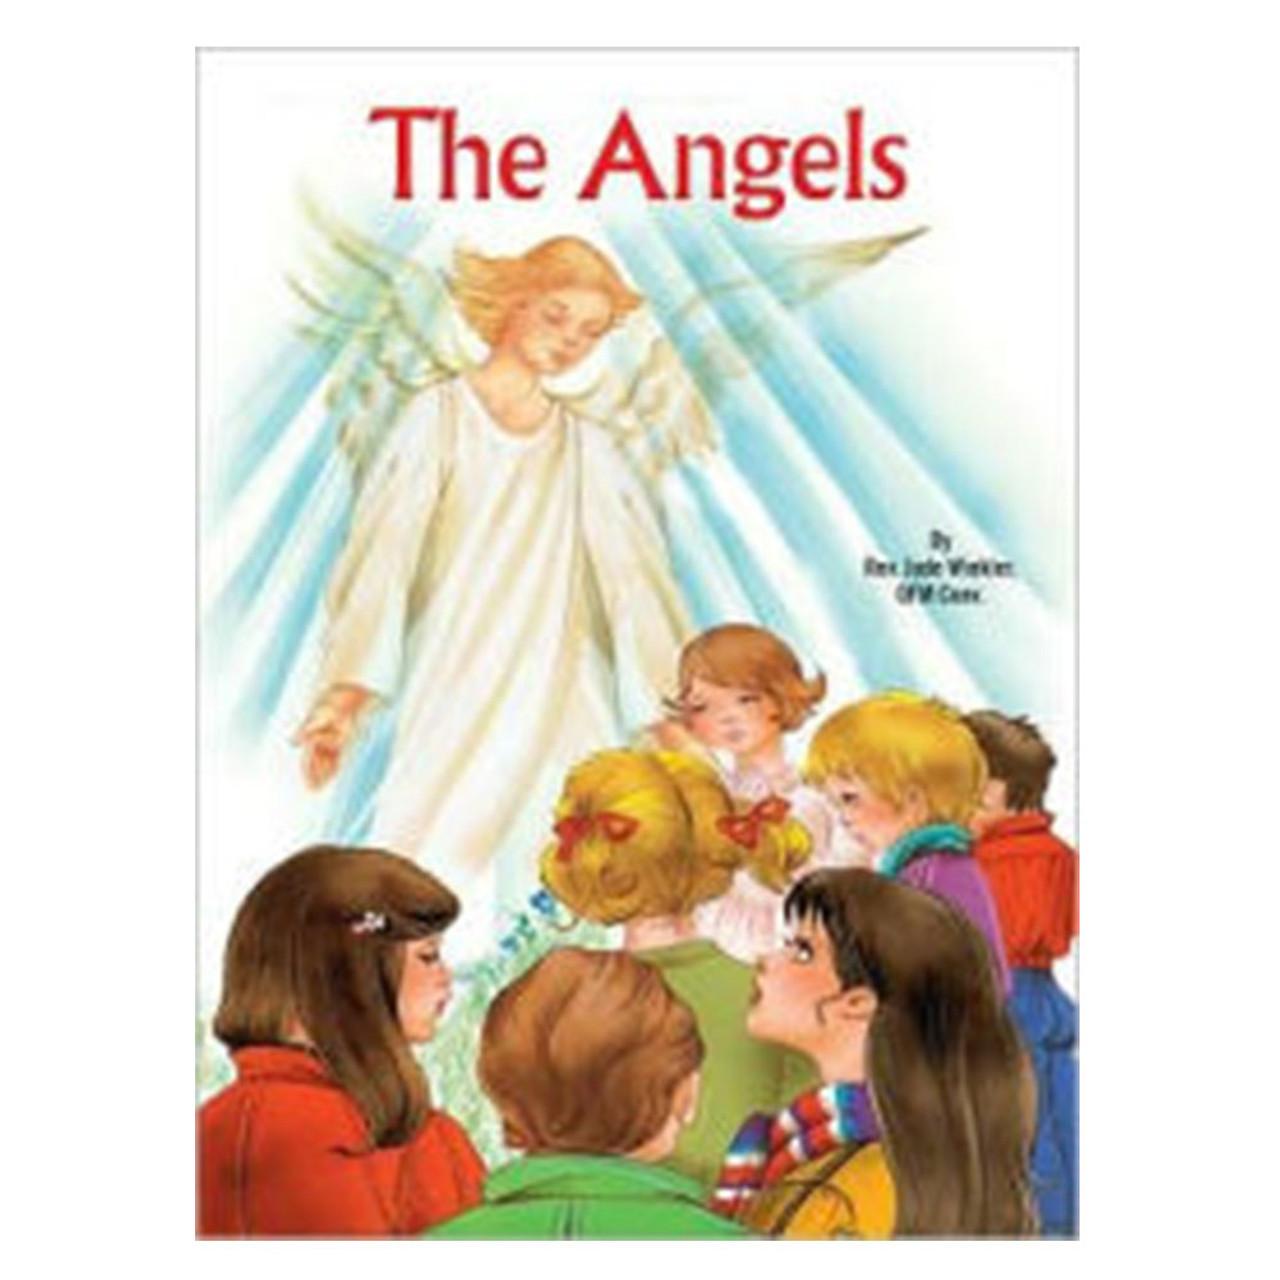 The Angels Winkler, Rev Jude